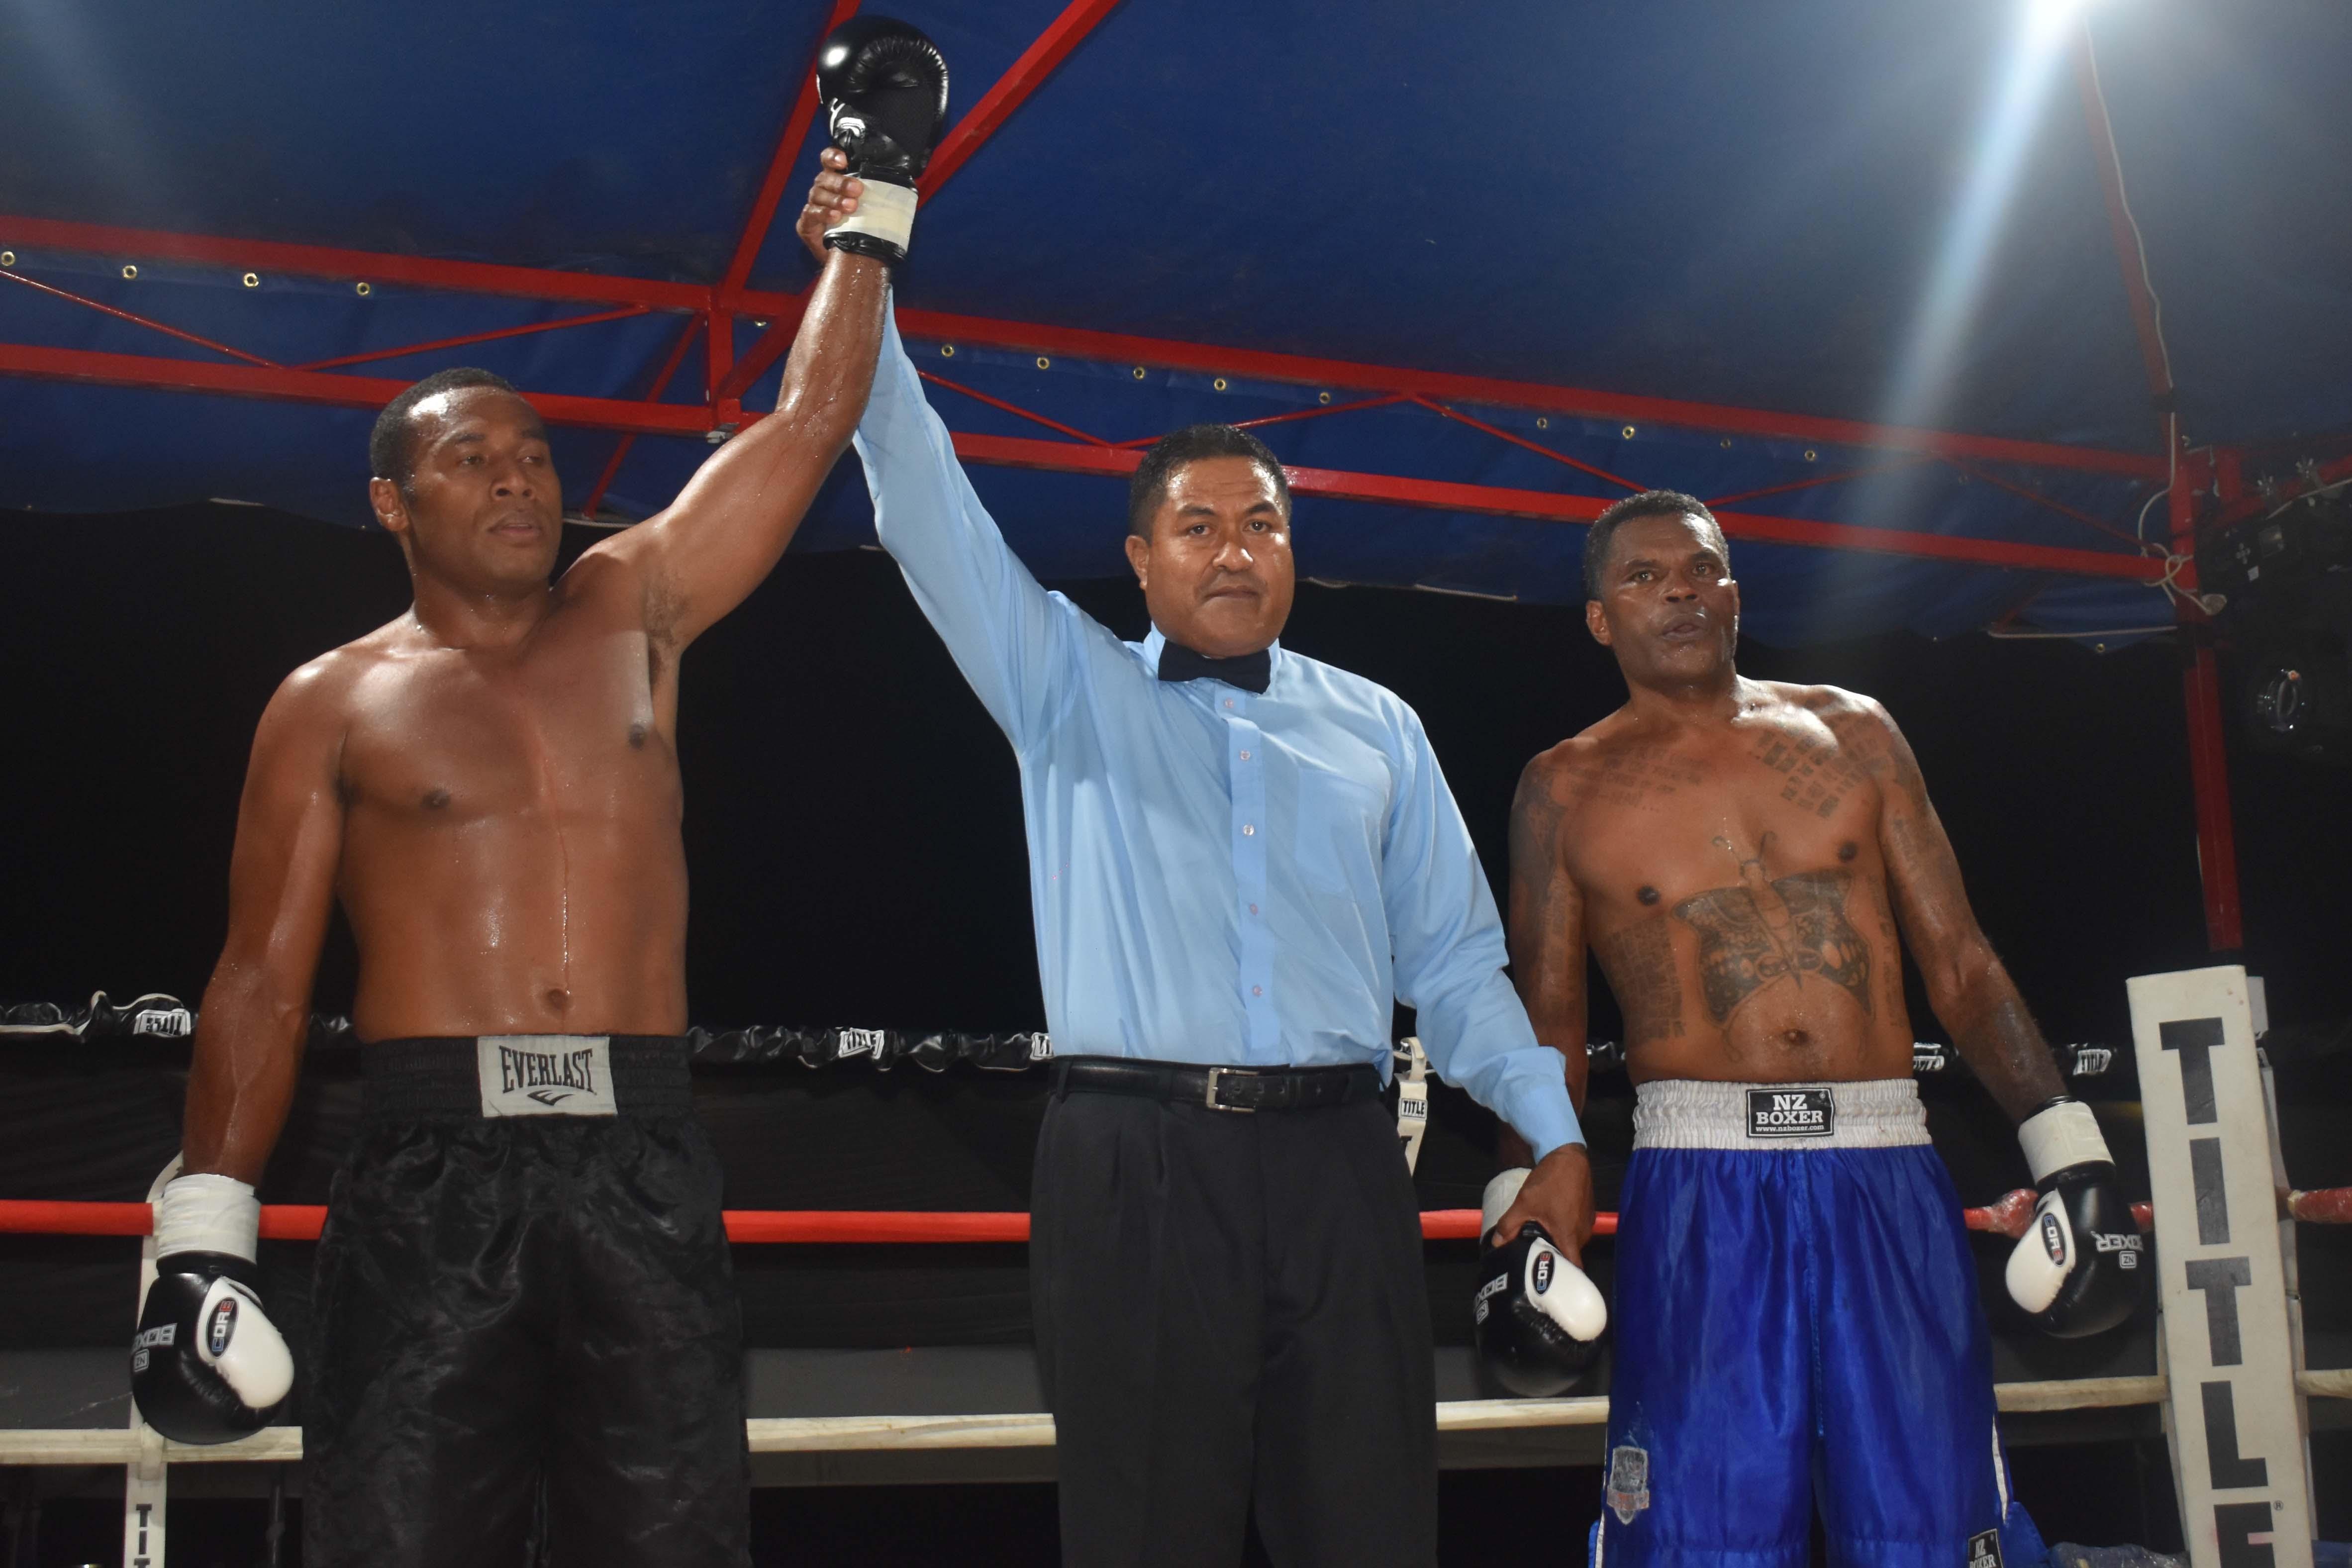 Savenaca Naliva wins over Sakiusa Mekemeke in the boxing programme at the Prince Charles Park in Nadi last night. Photo: WAISEA NASOKIA